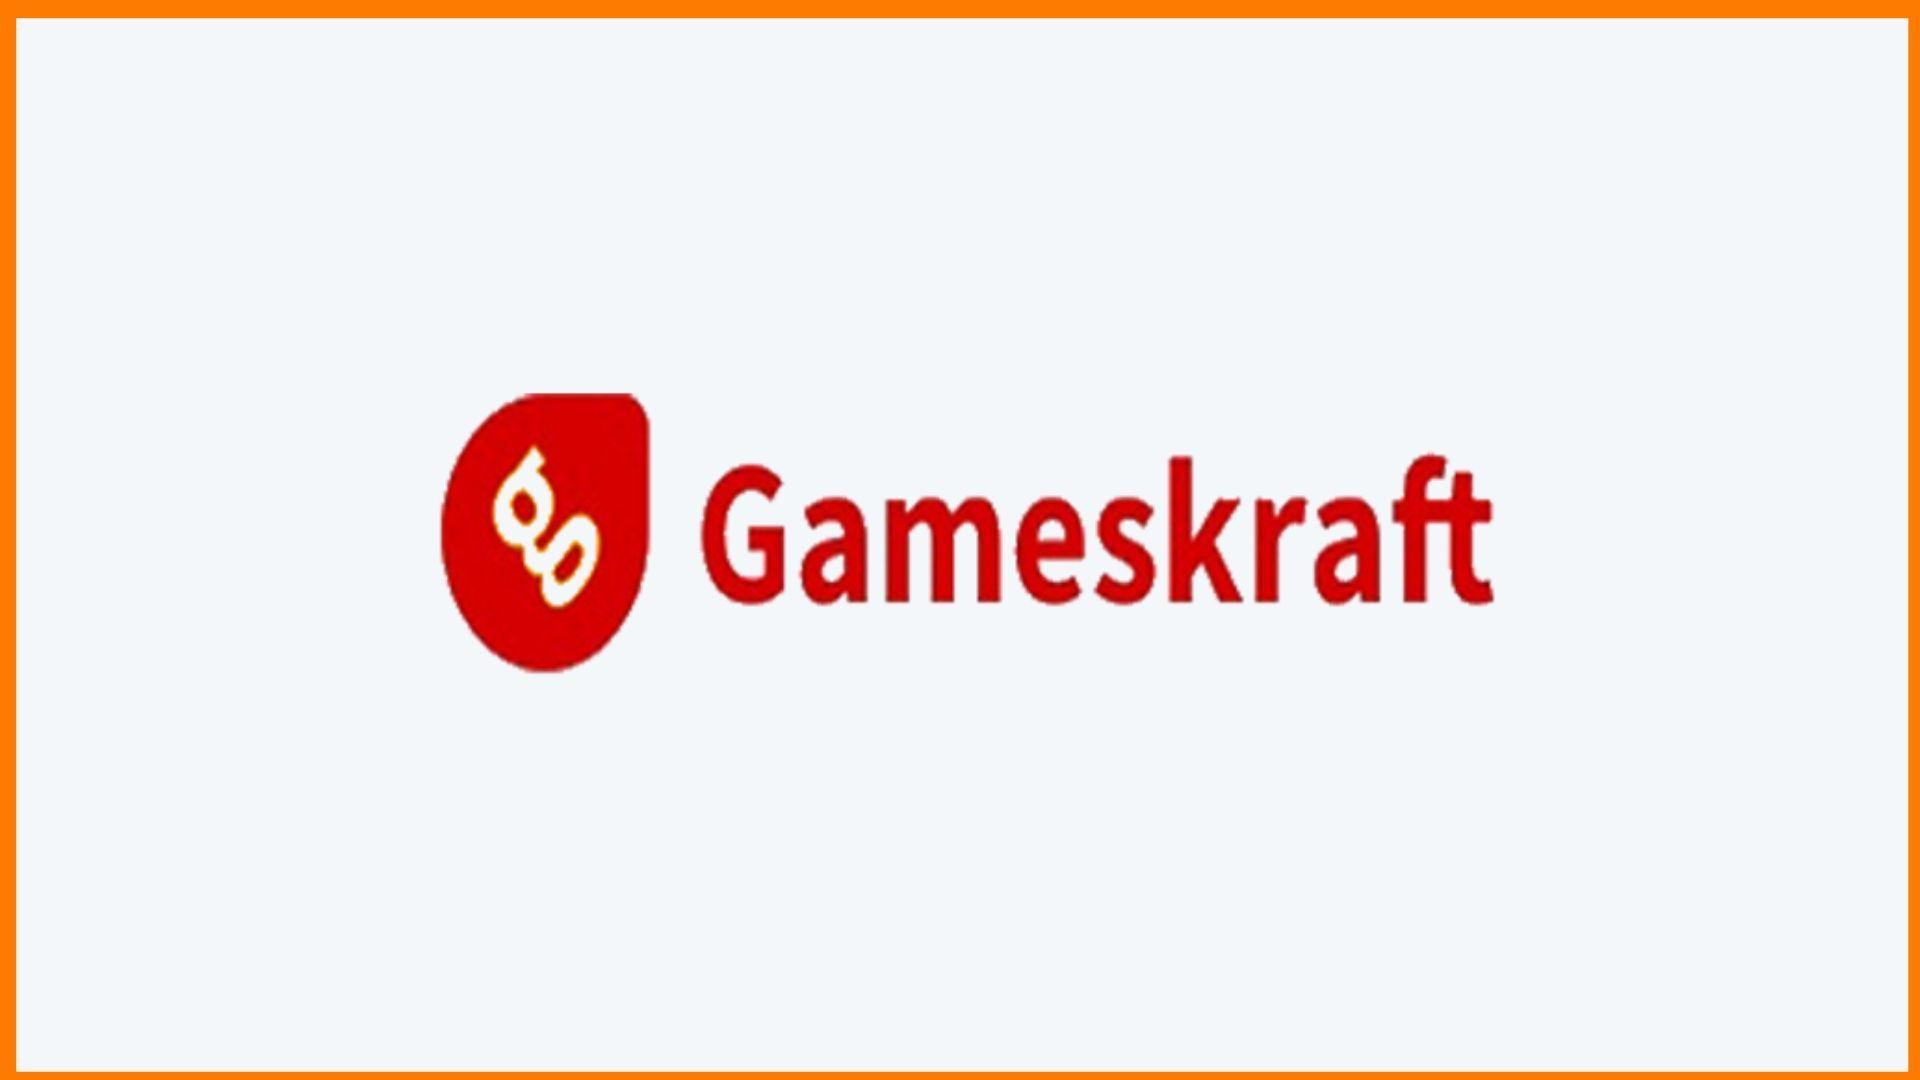 Gameskraft logo - Prithvi Singh Gamescraft